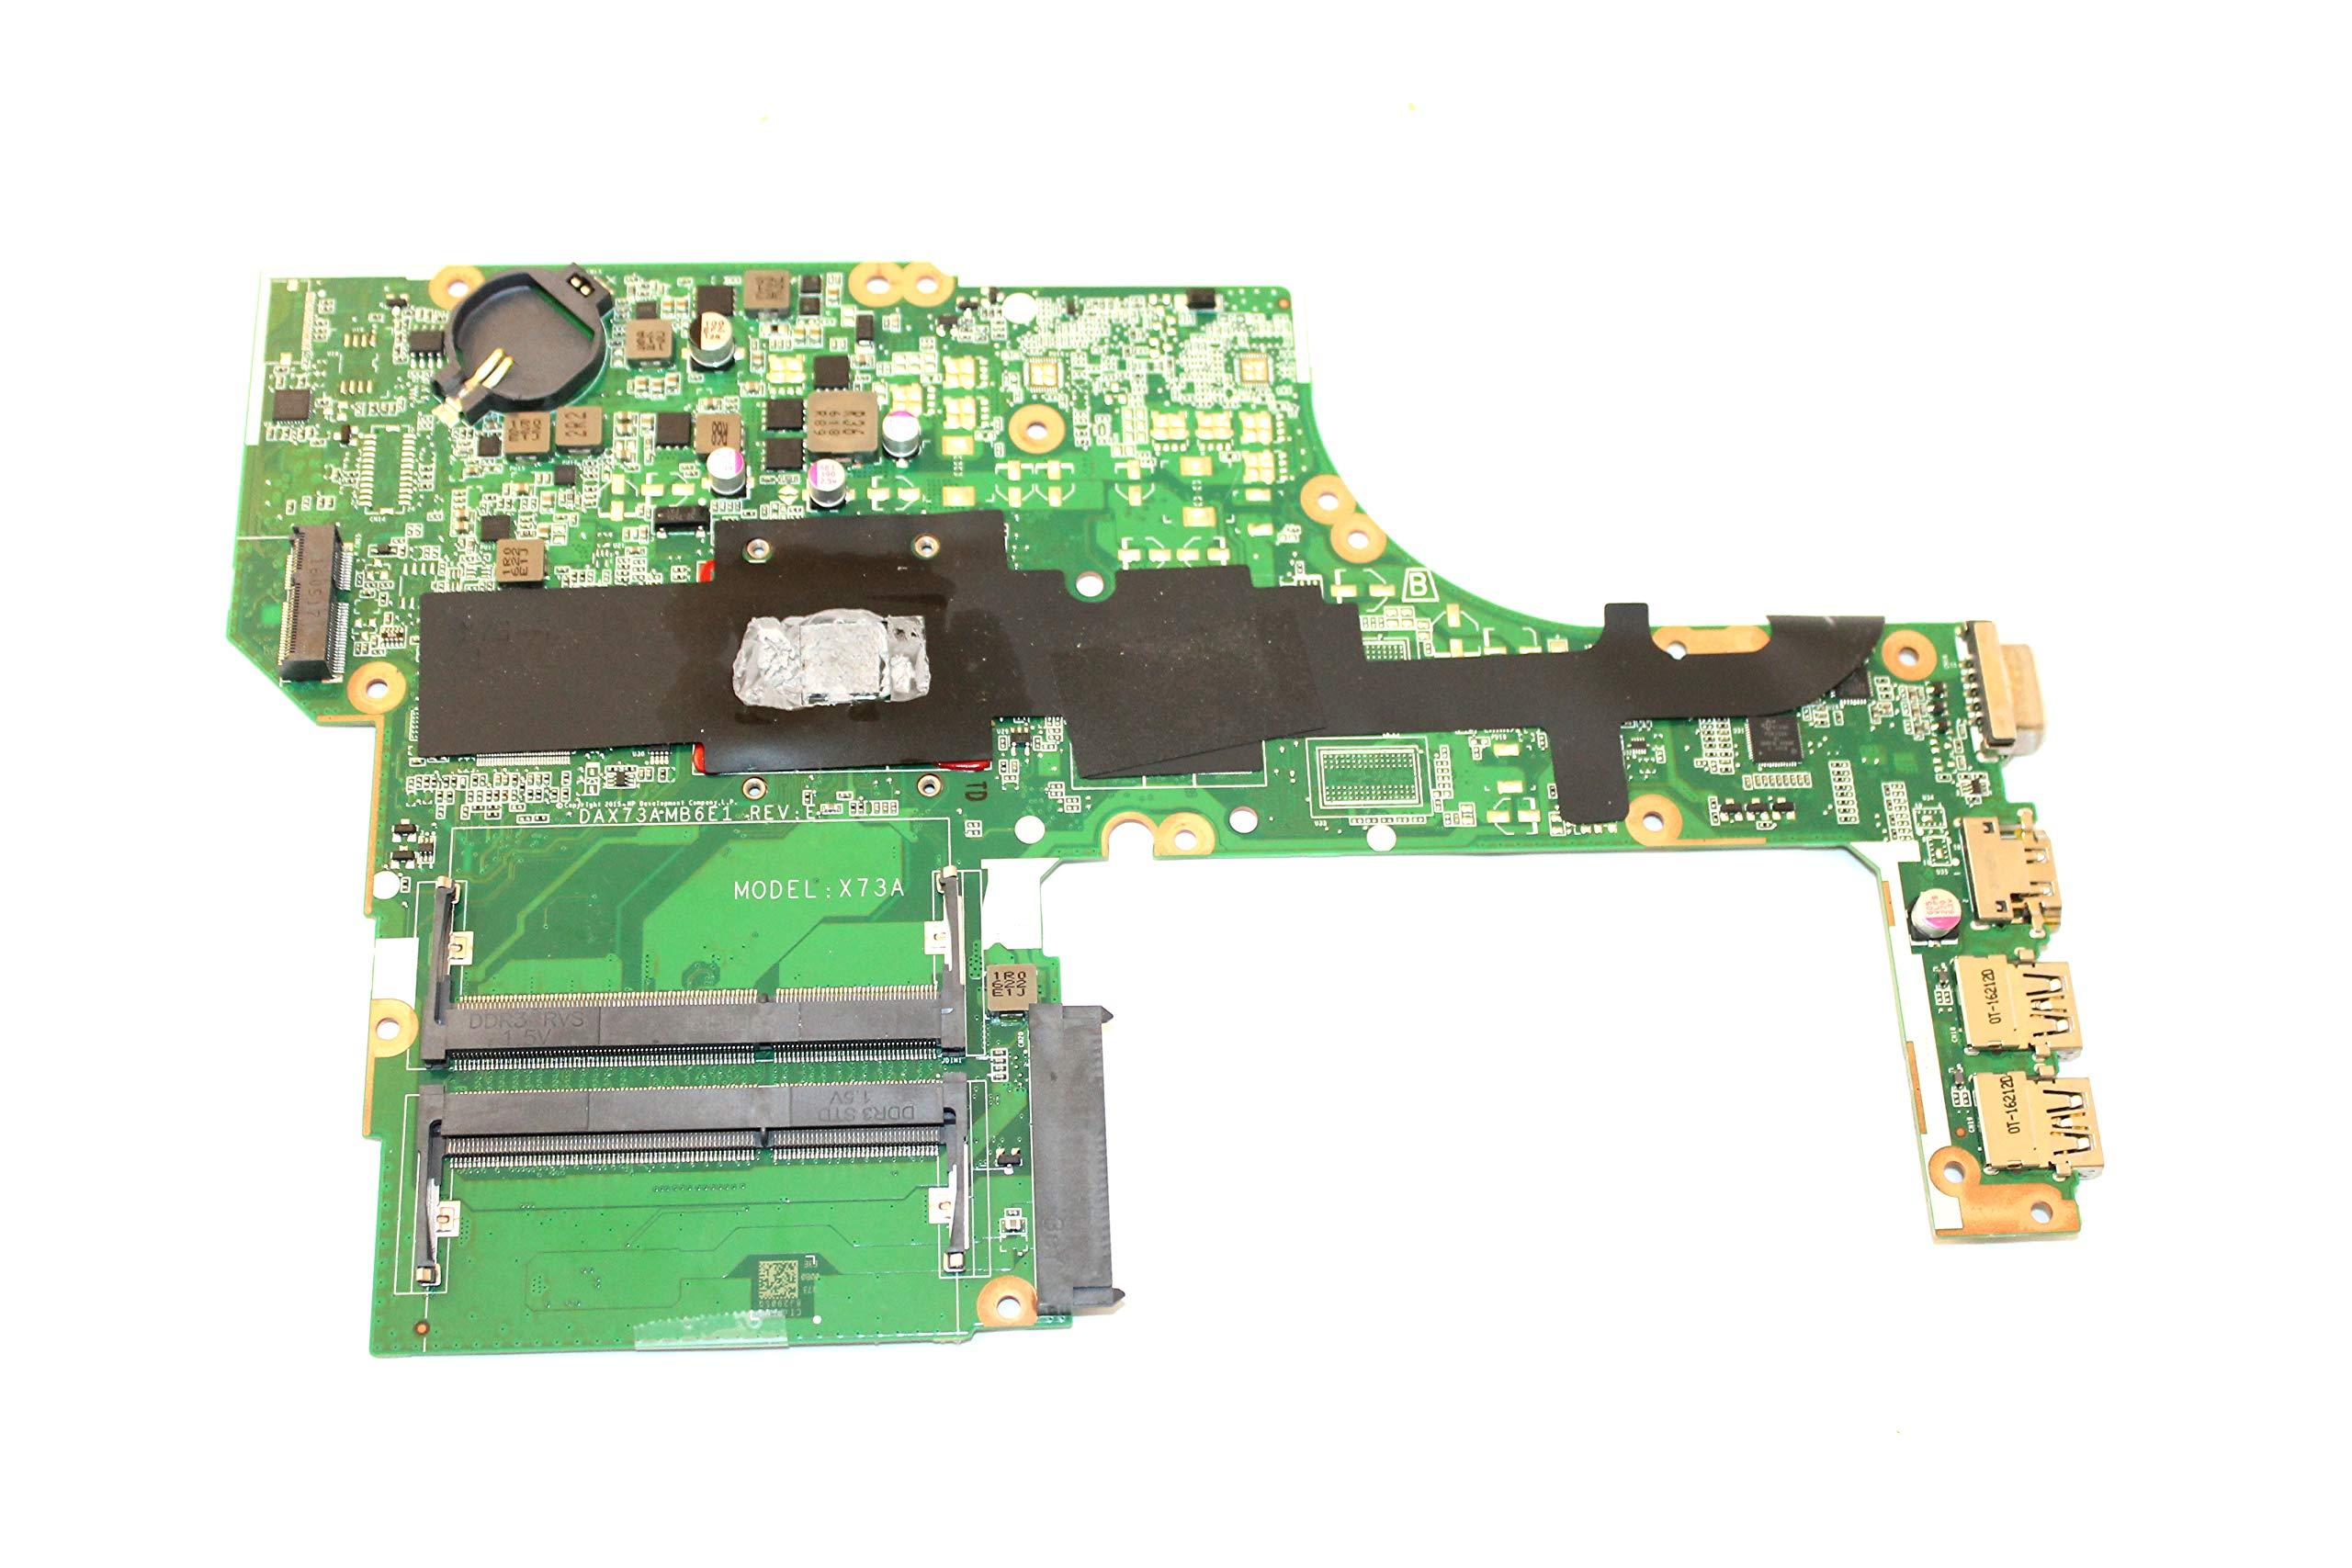 828435-001 ProBook 455 G3 Genuine AMD A4-7210 Motherboard DAX73AMB6E1